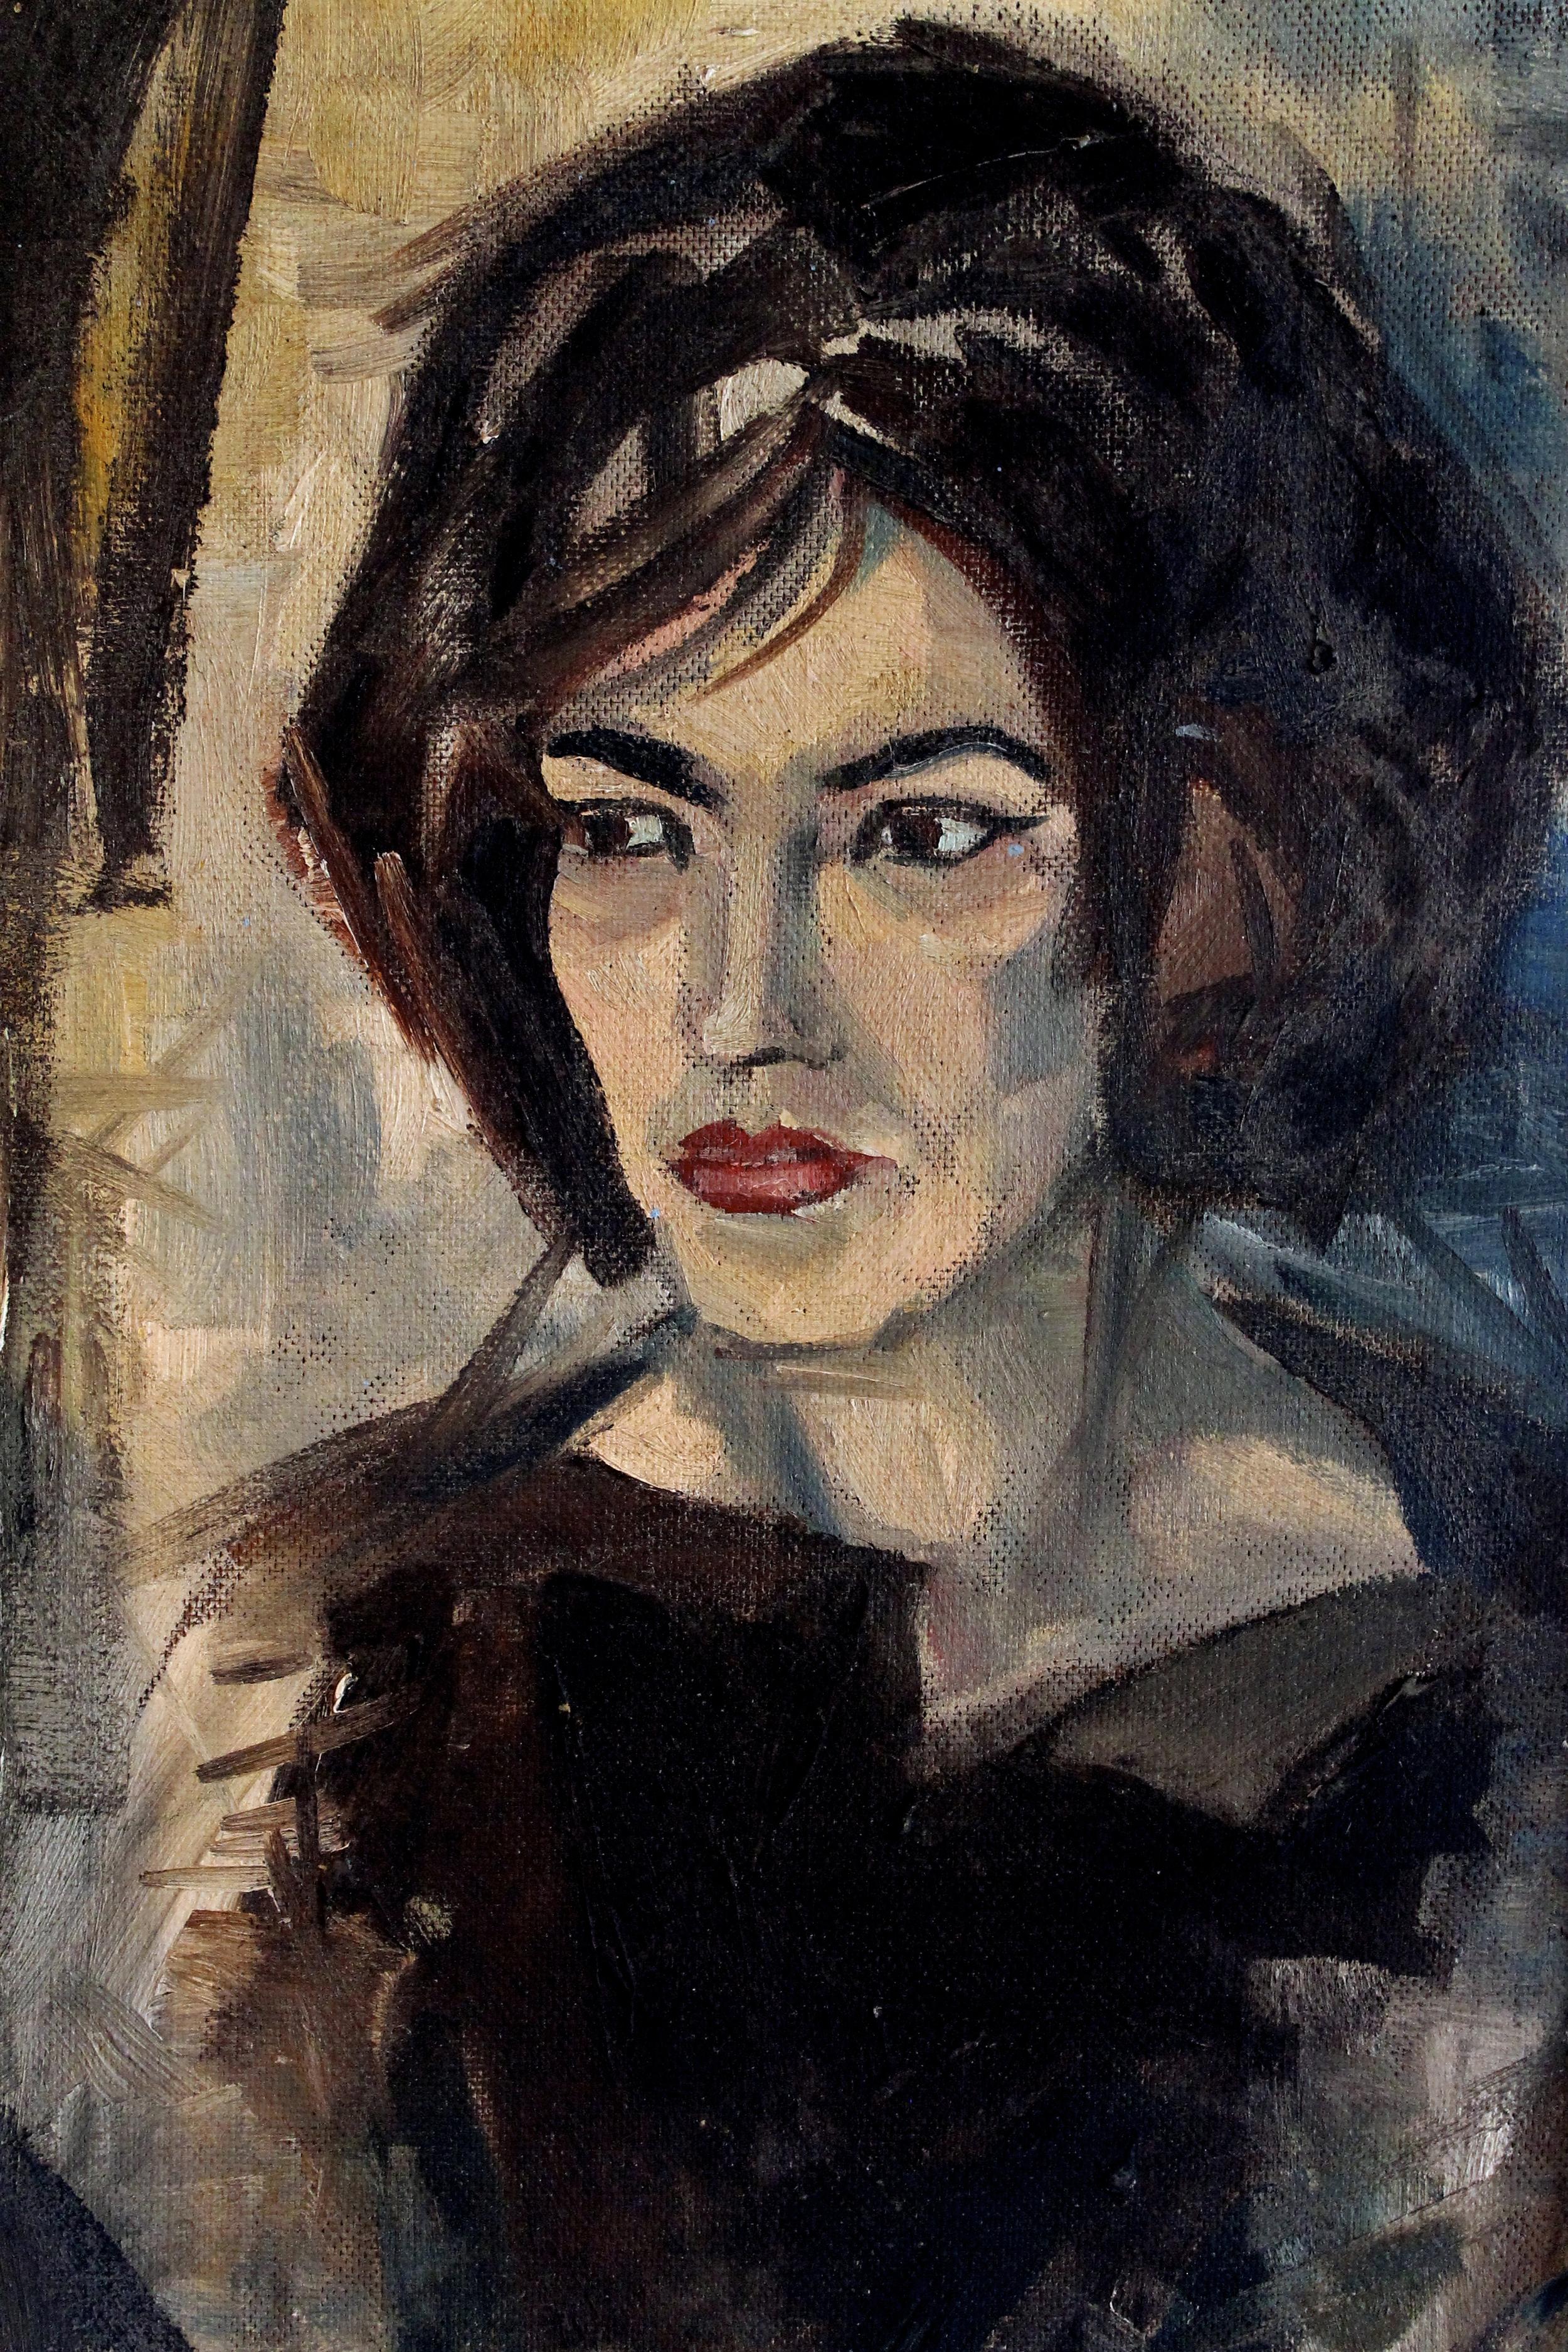 The Quiet Painter, by Michelle Annette Tremblay, Photo of Arne Roosman's original art by Michelle Annette Tremblay